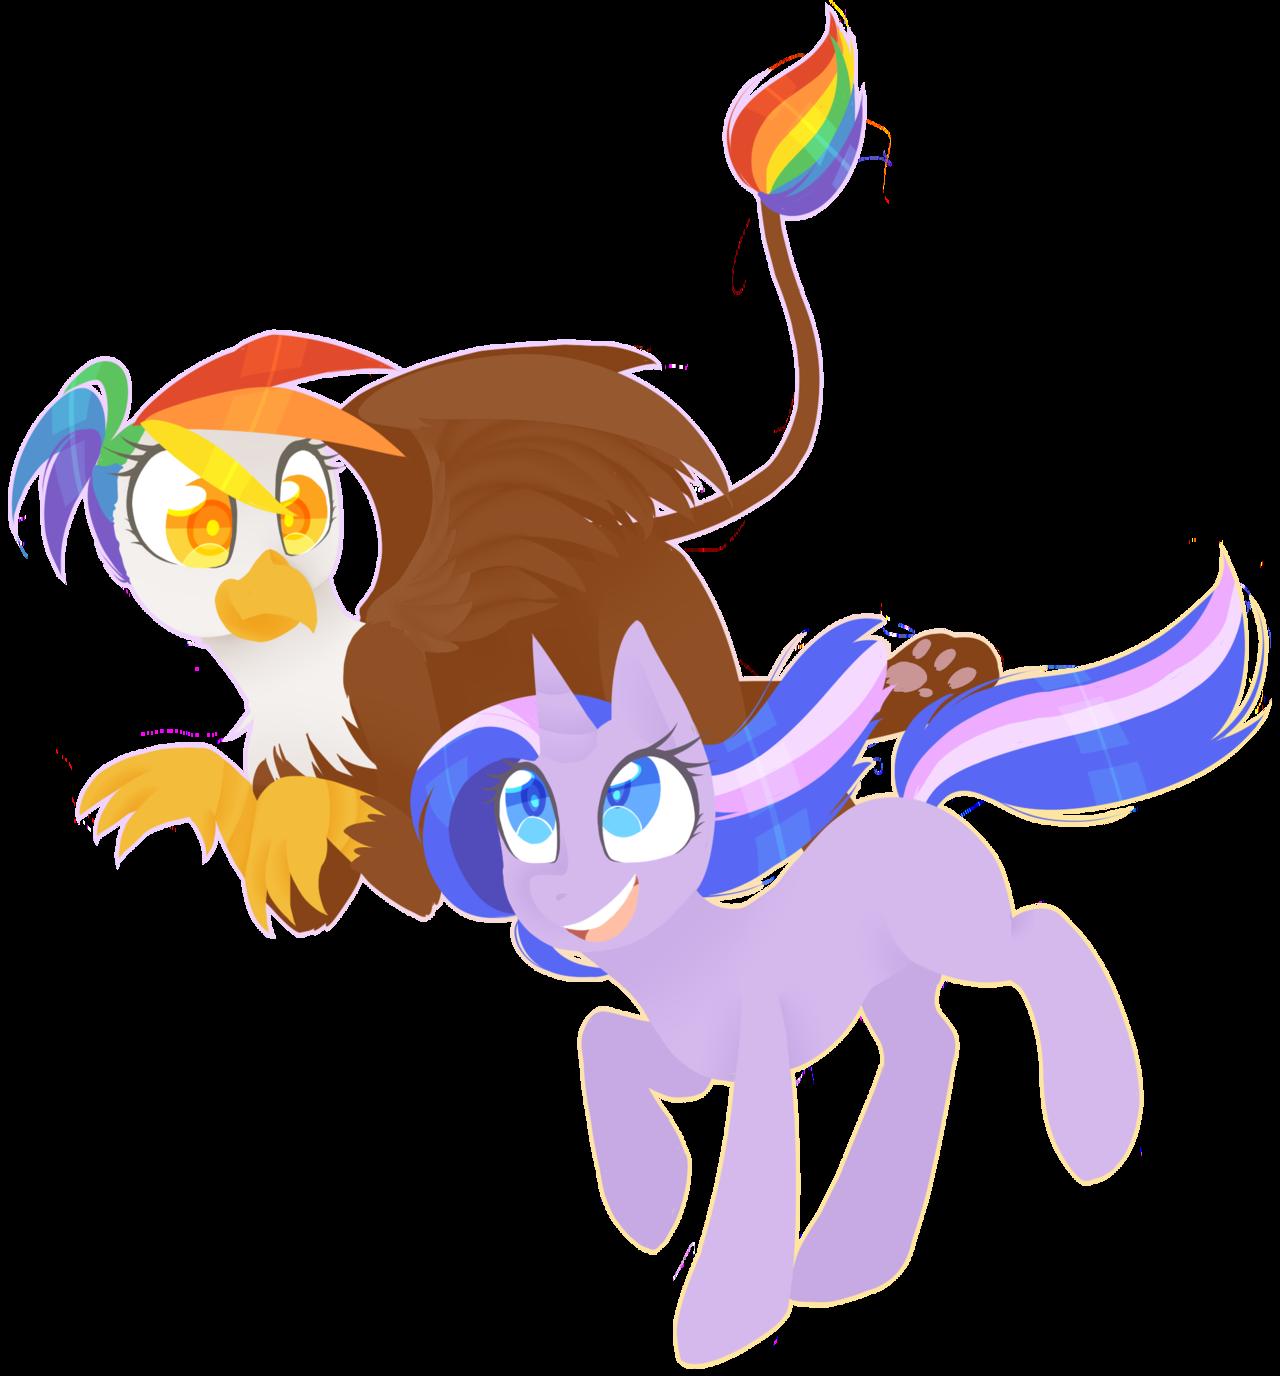 Clipart rainbow feather. Wiw my little pony